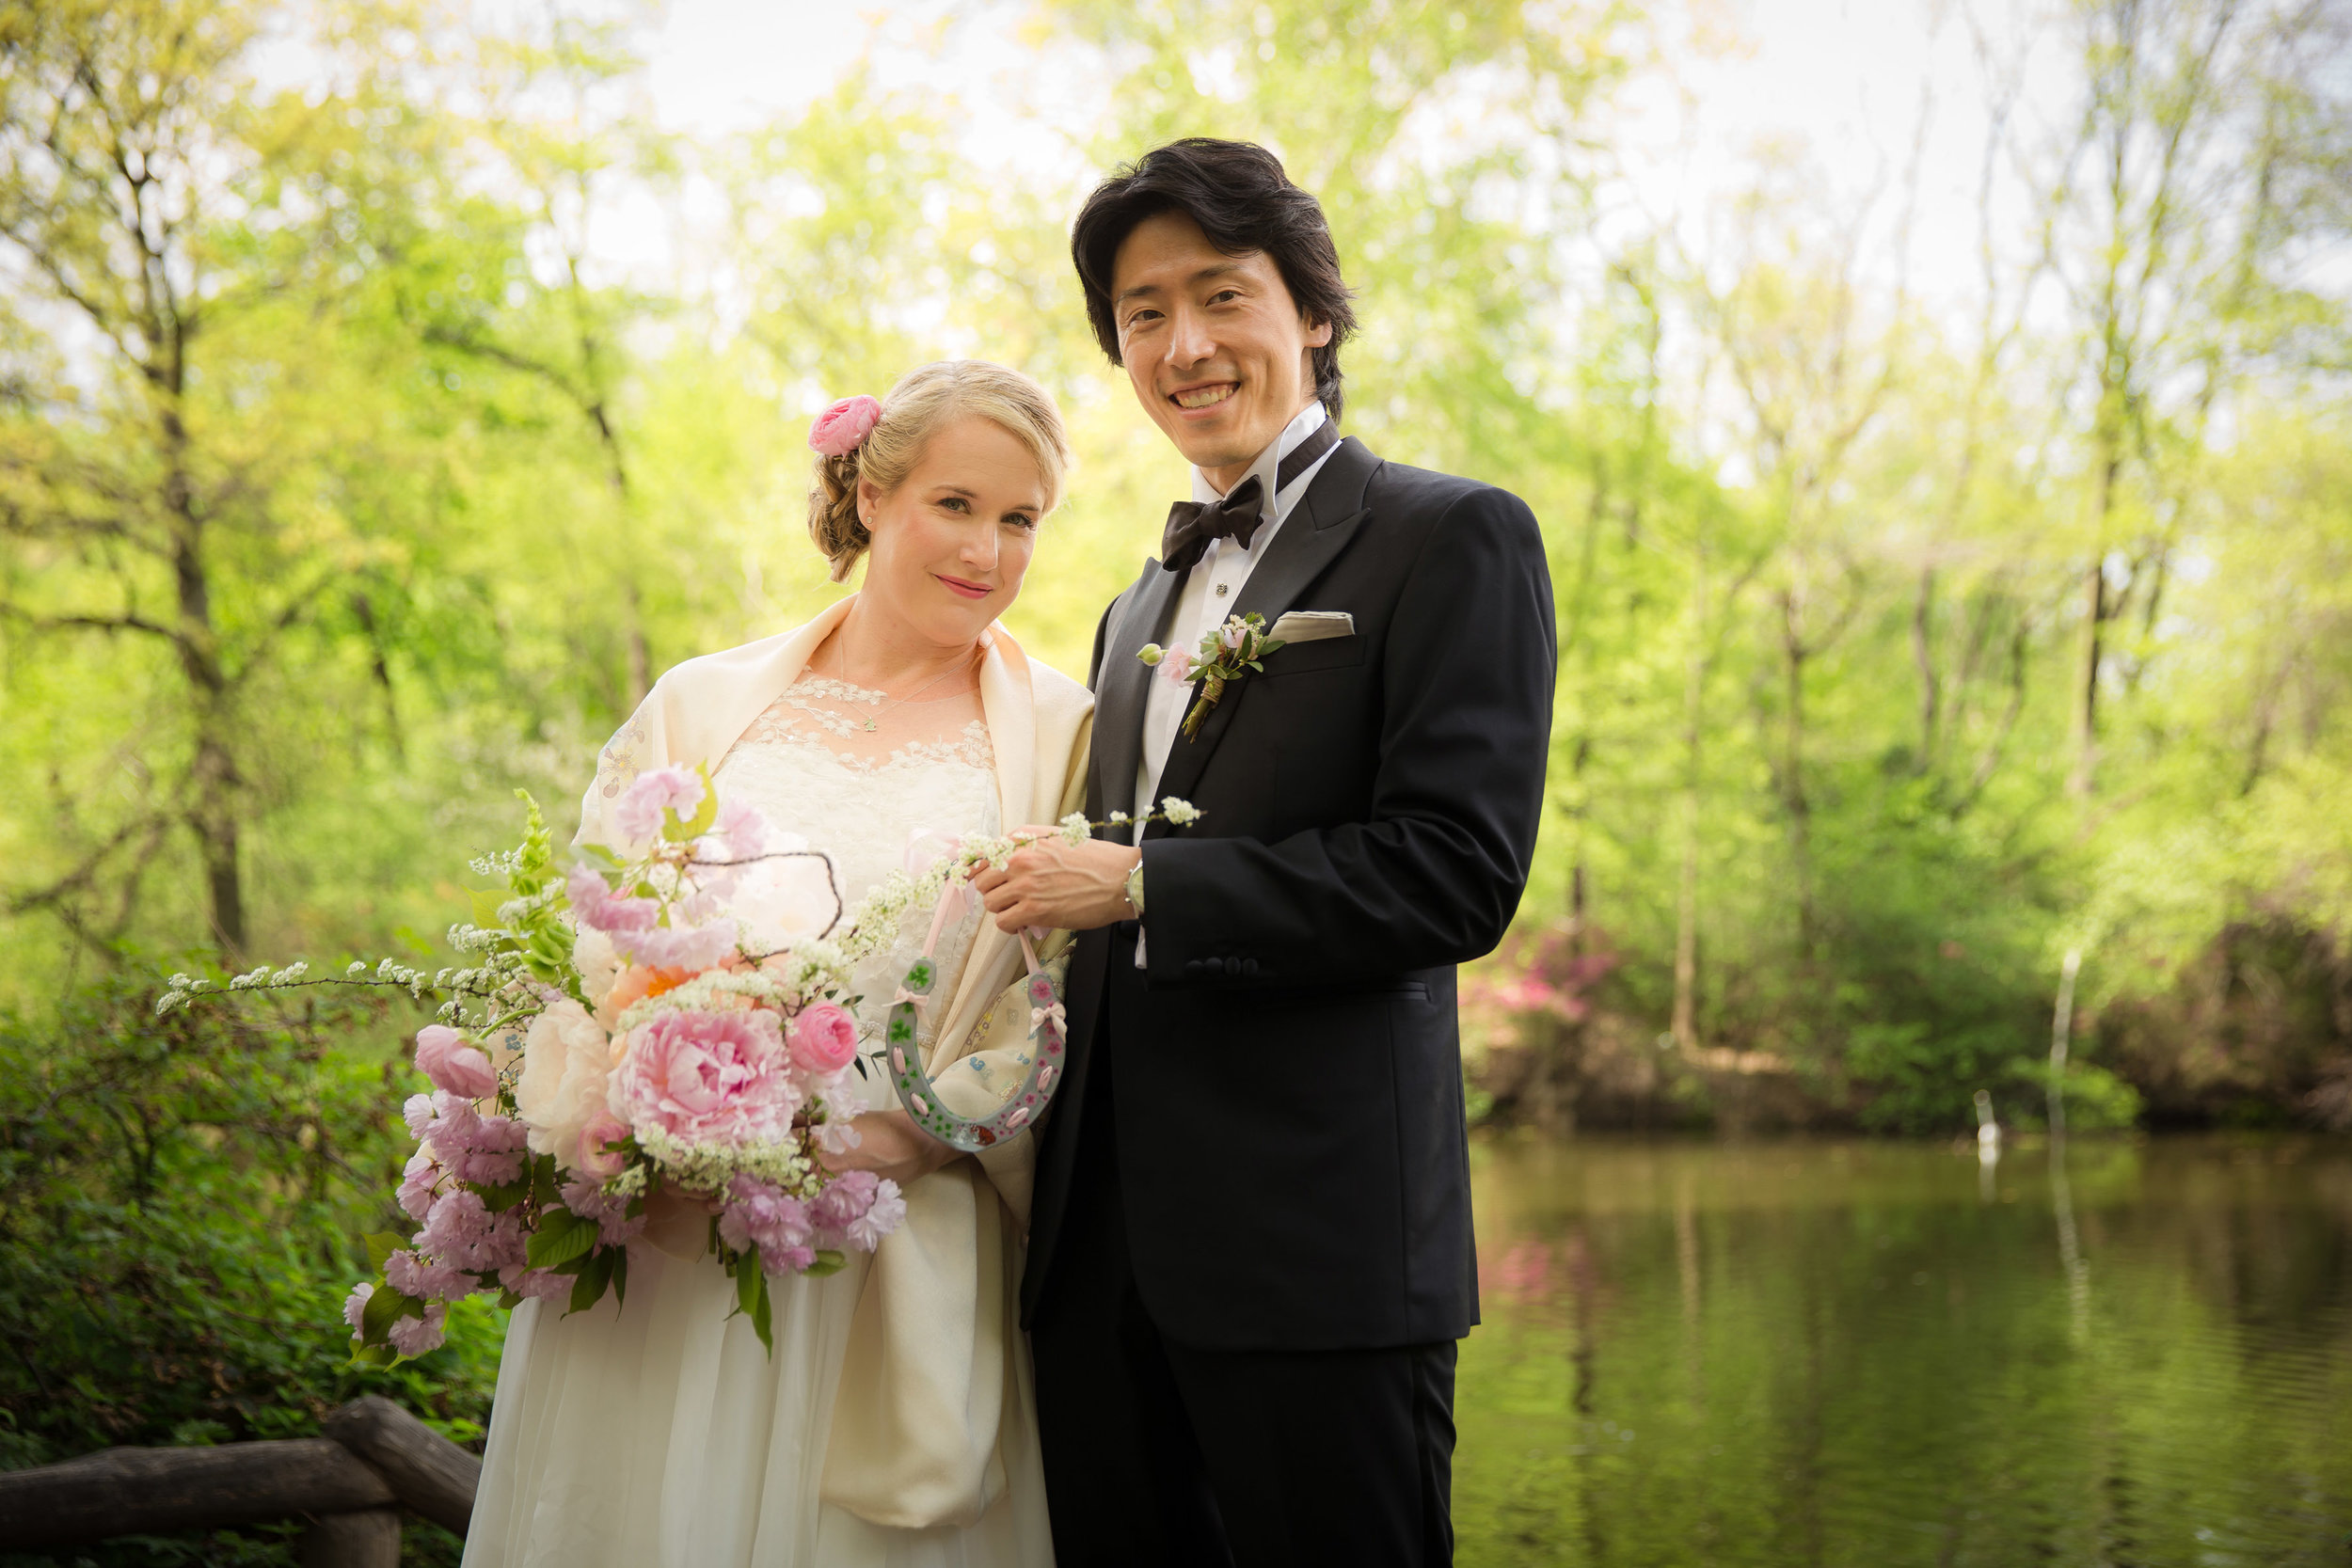 victorious-events-nyc-009-colleen-taka-central-park-zoo-wedding-raymond-hamlin.jpg